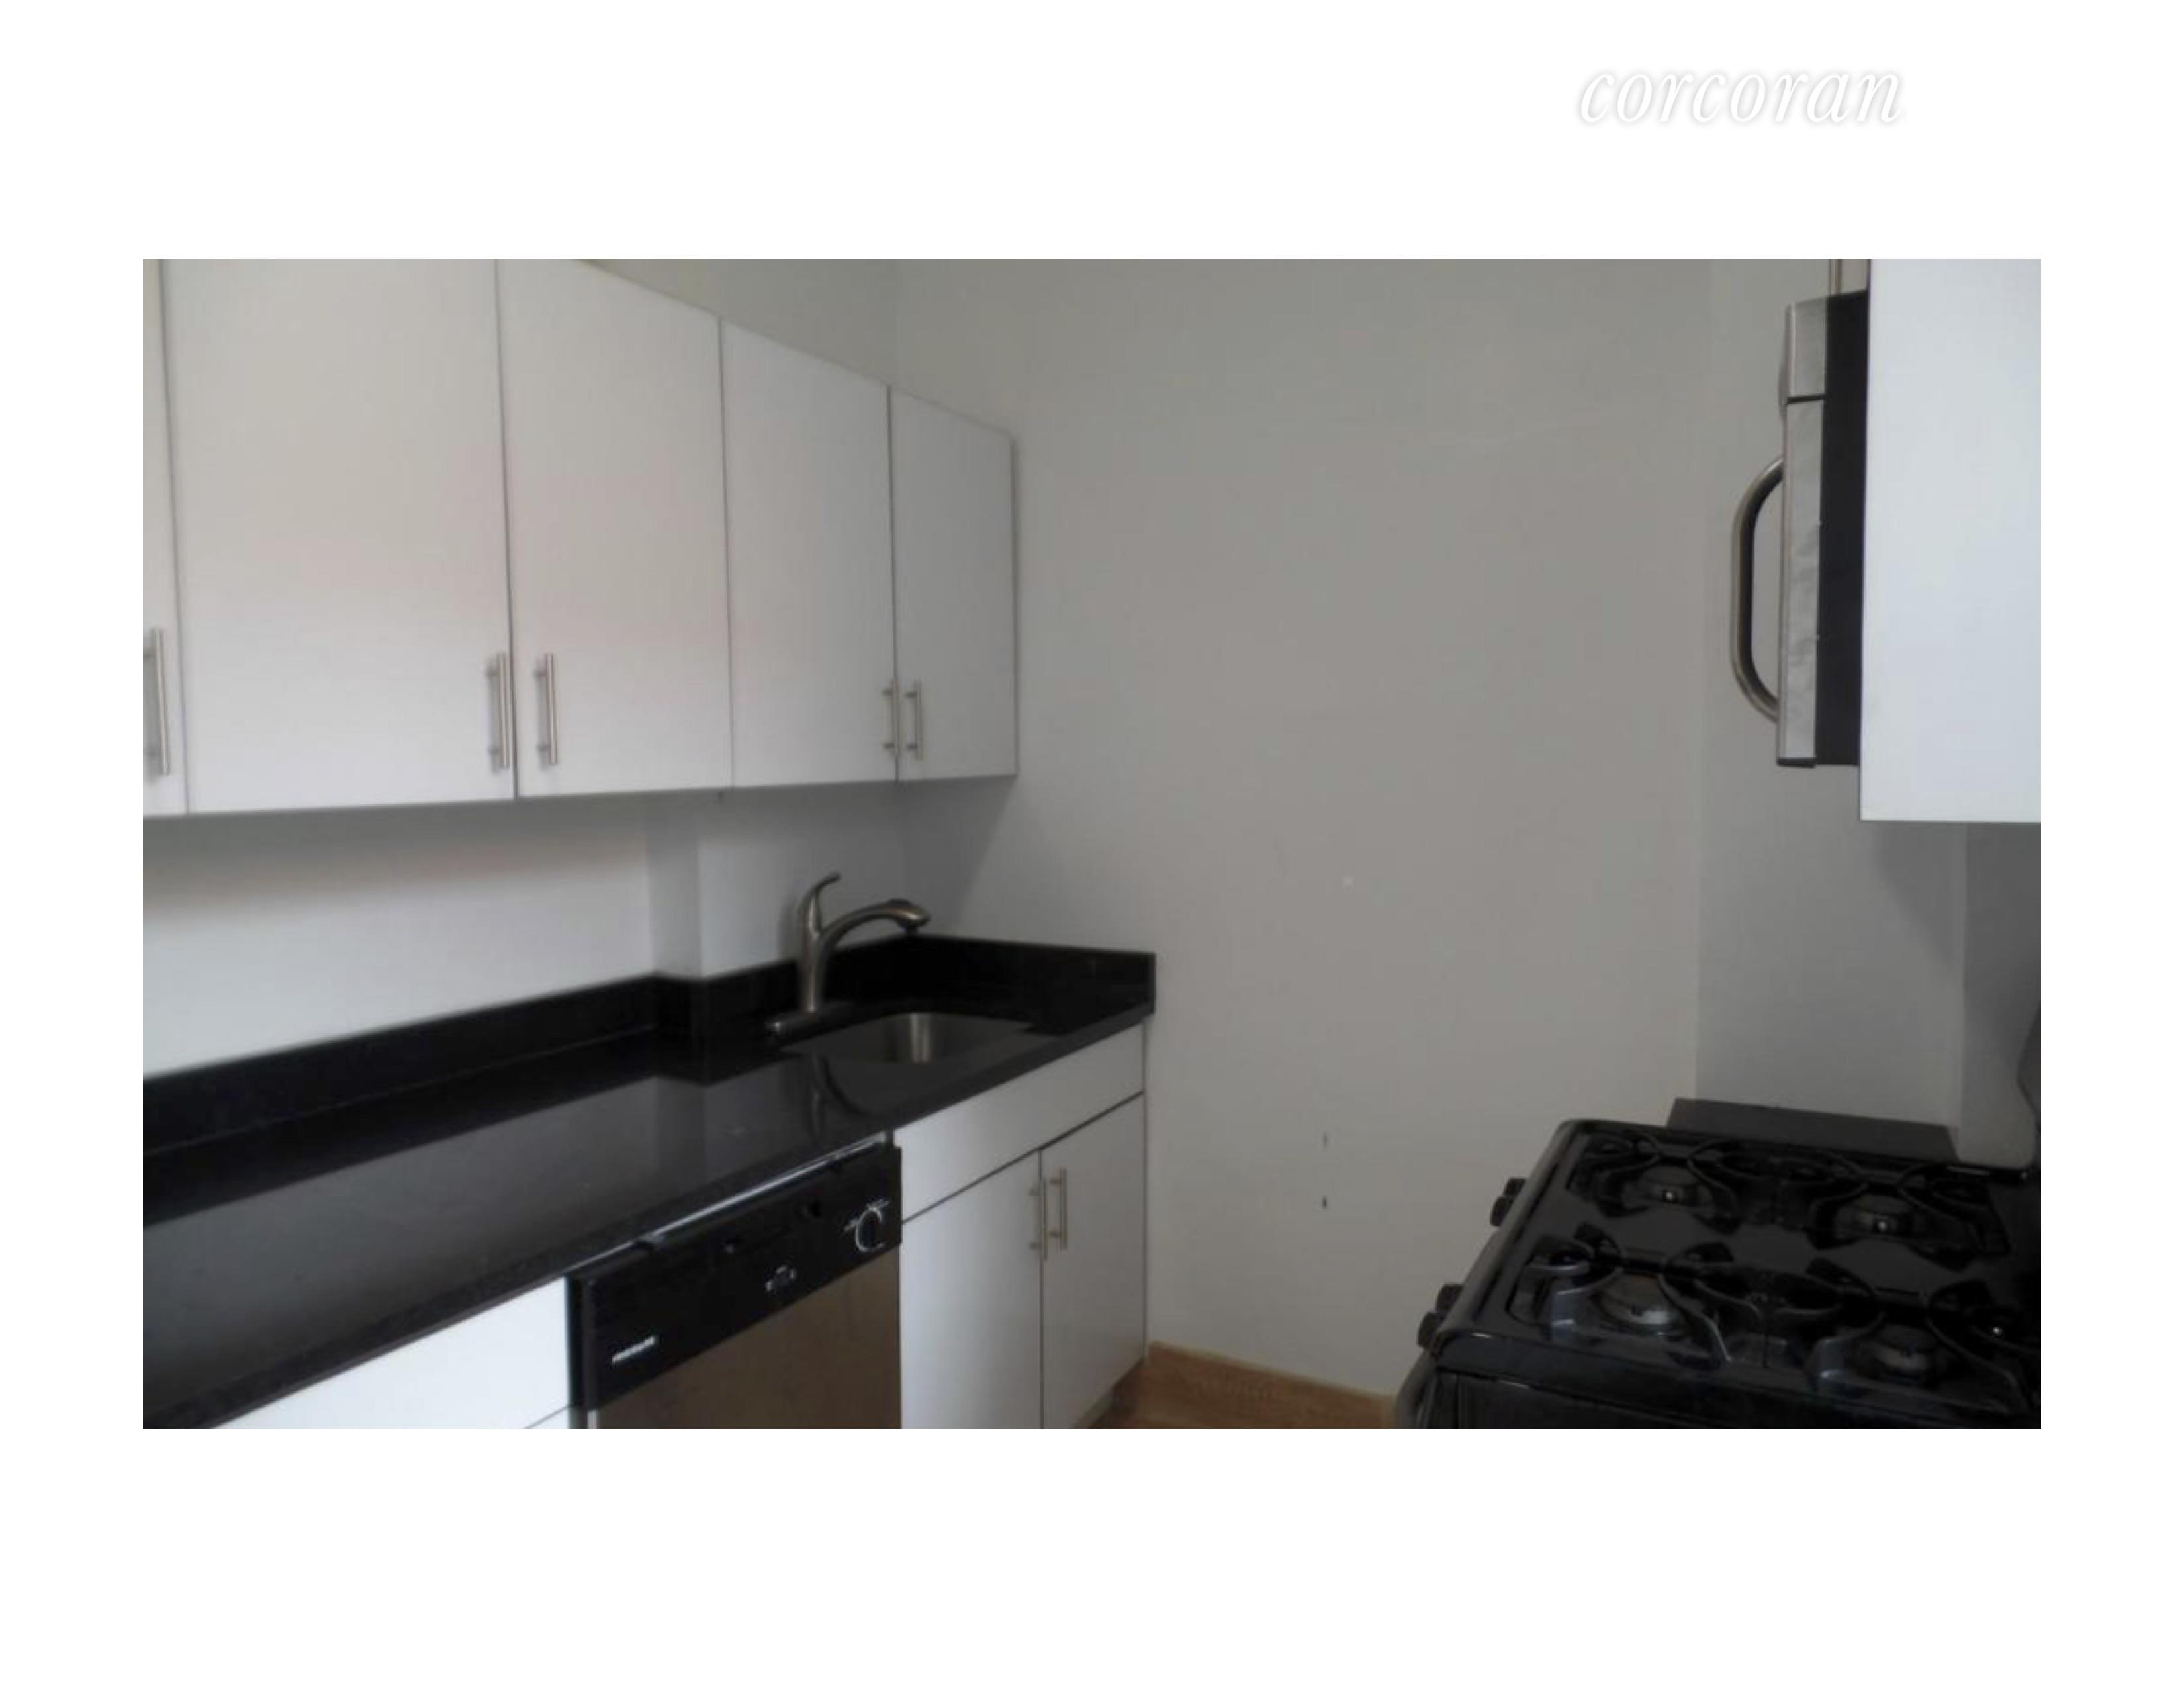 556 West 156th Street, Apt 5, Manhattan, New York 10032